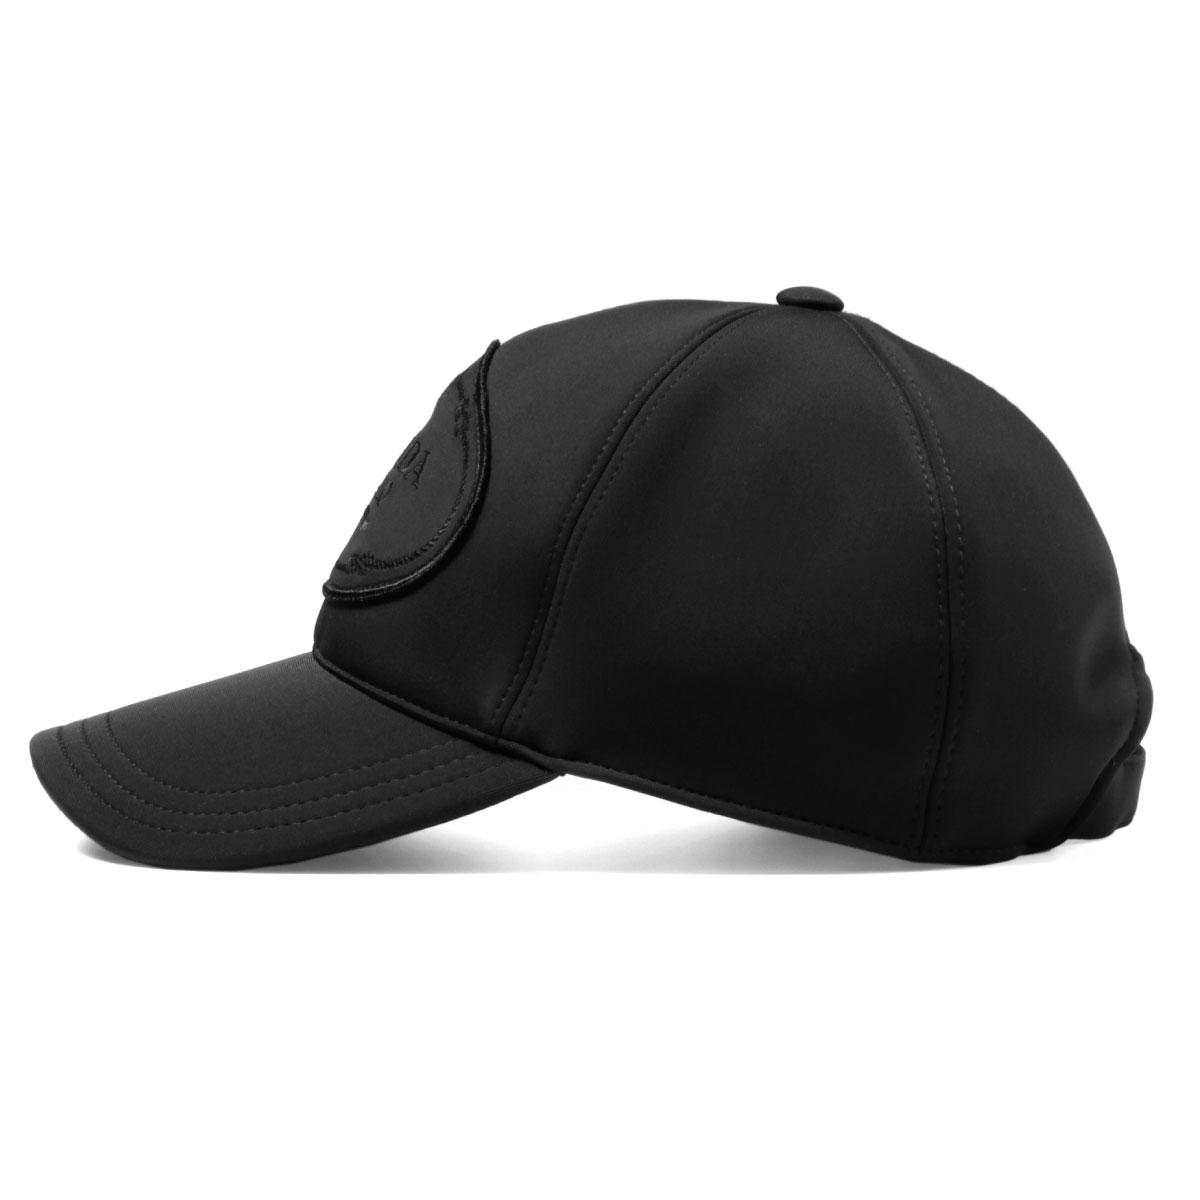 d8f04d6b importshopdouble: Prada PRADA cap Lady's 1HC274 2BQA F0002 NERO black |  Rakuten Global Market